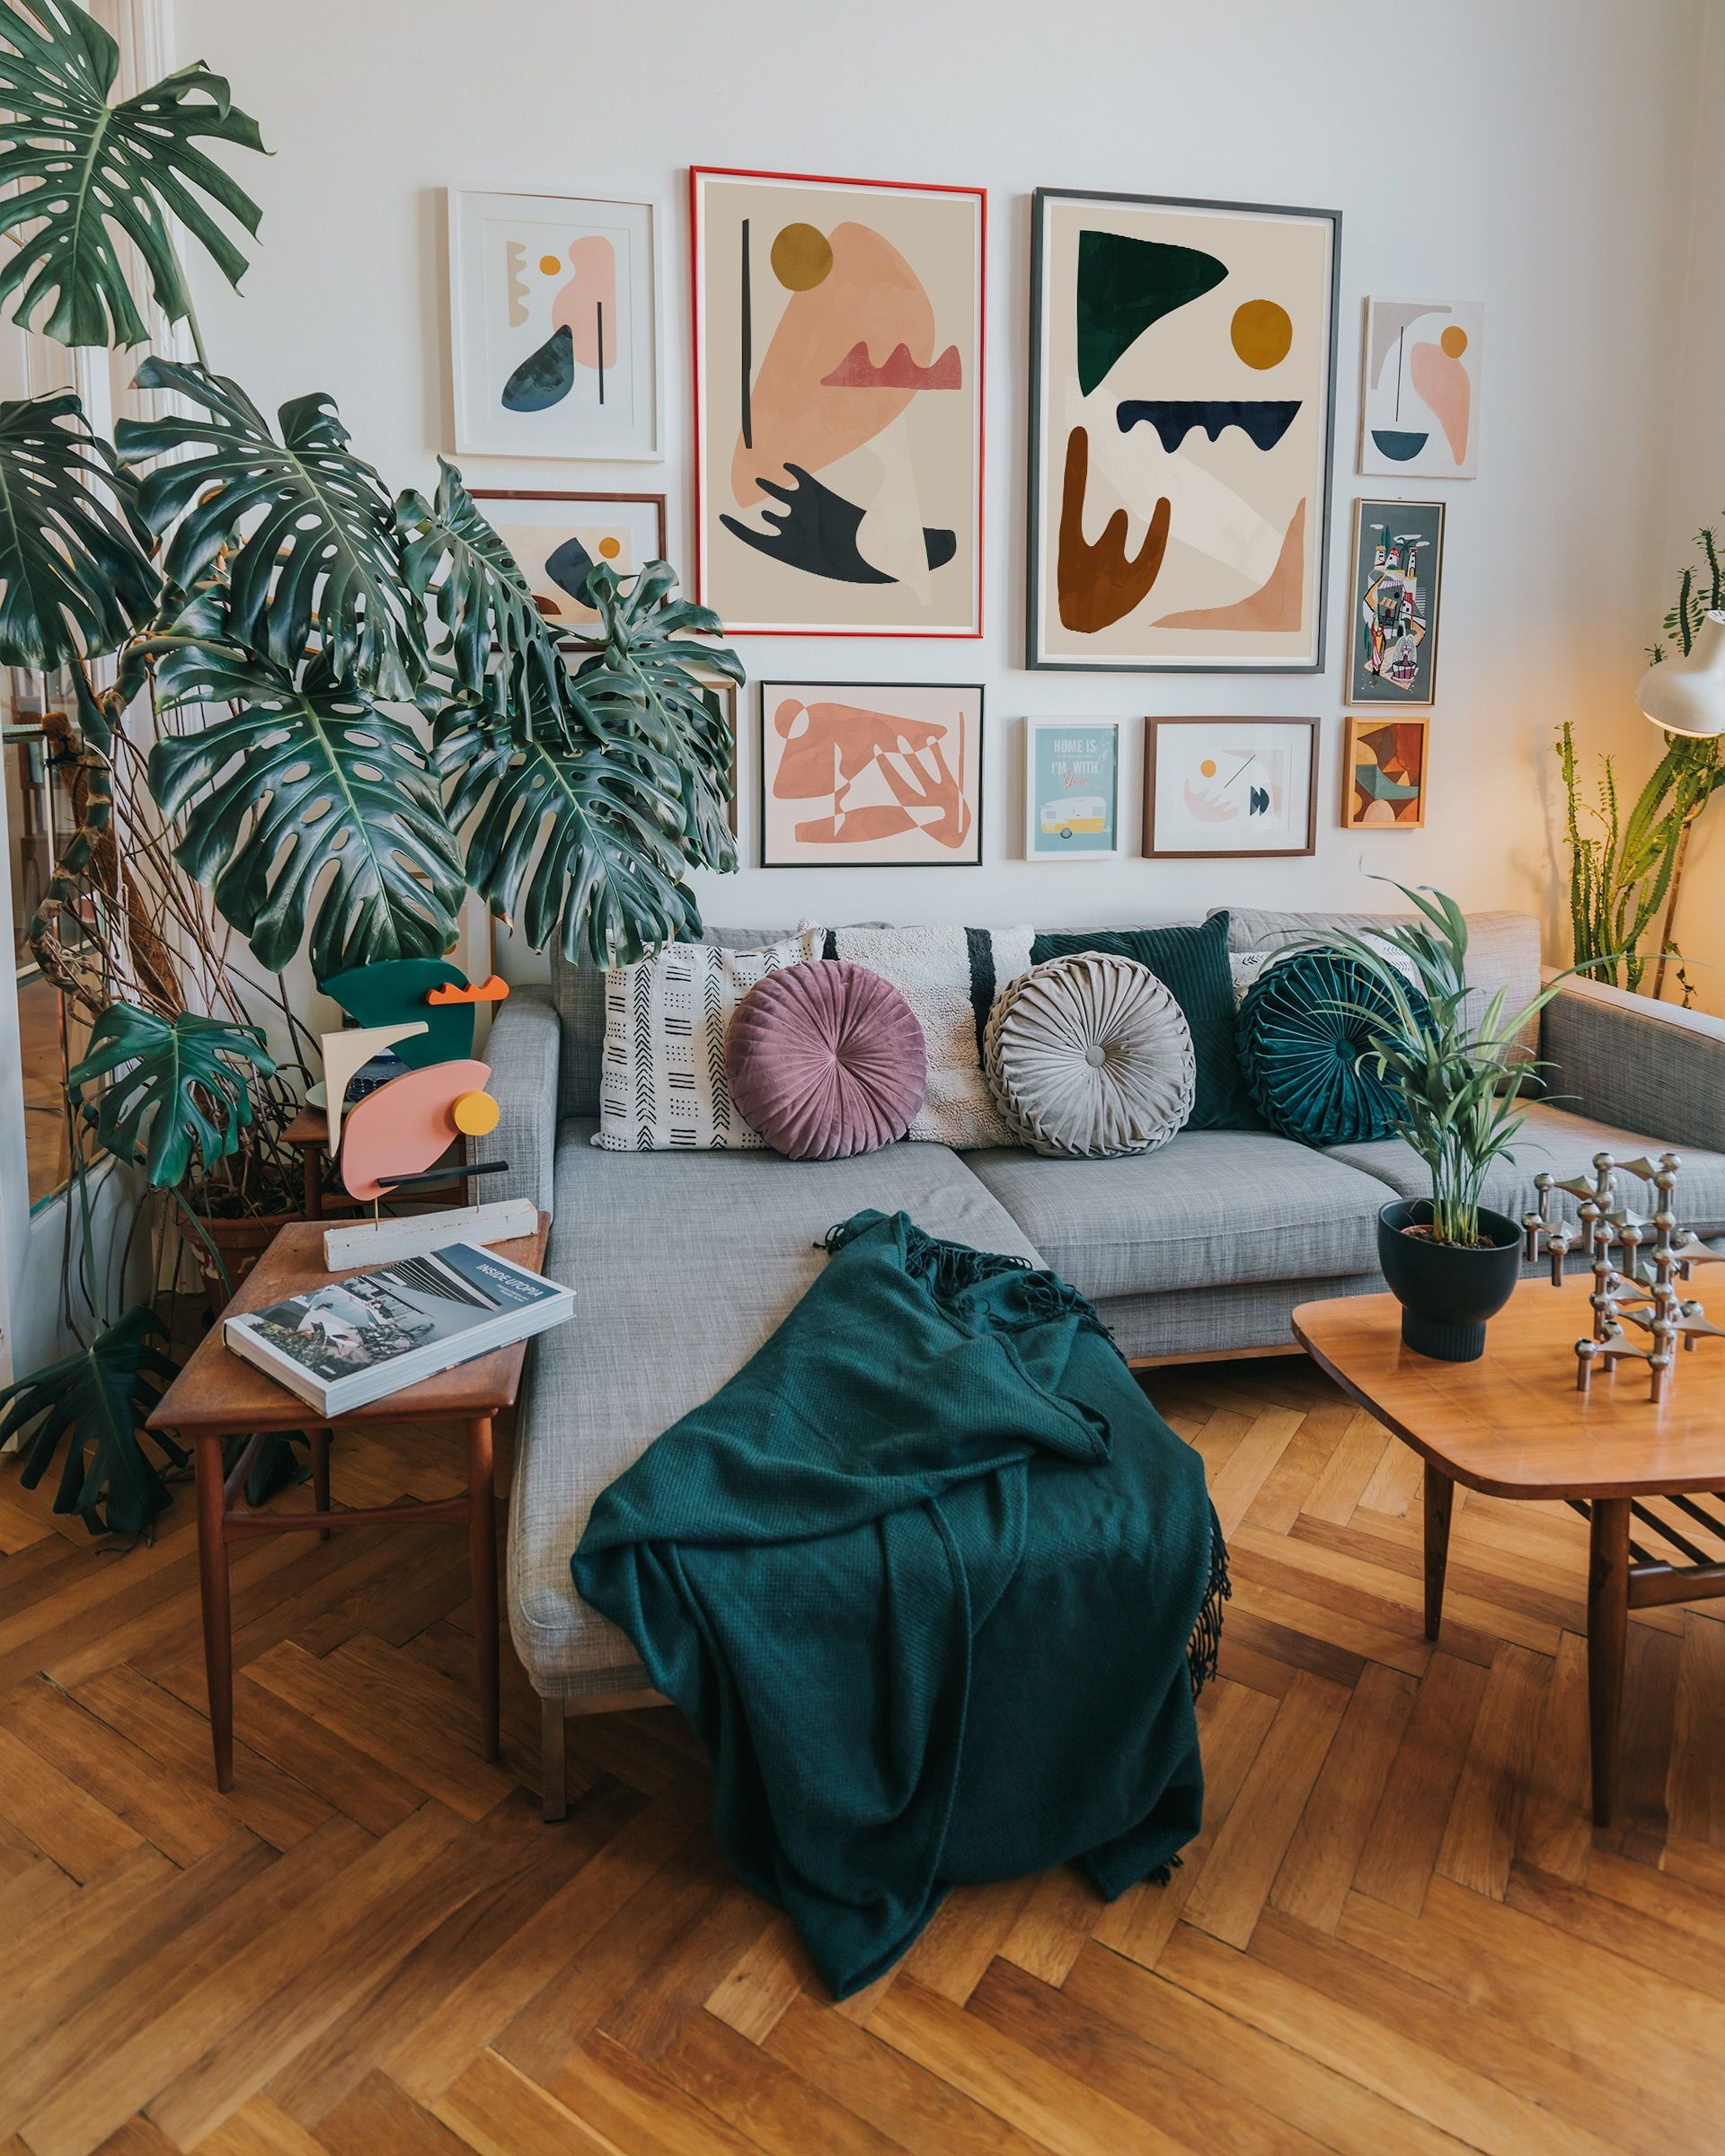 Jan Skacelik Art Original Abstract Paintings And Art Prints Living Room Decor Home Decor Living Decor Living room surrealsim realism